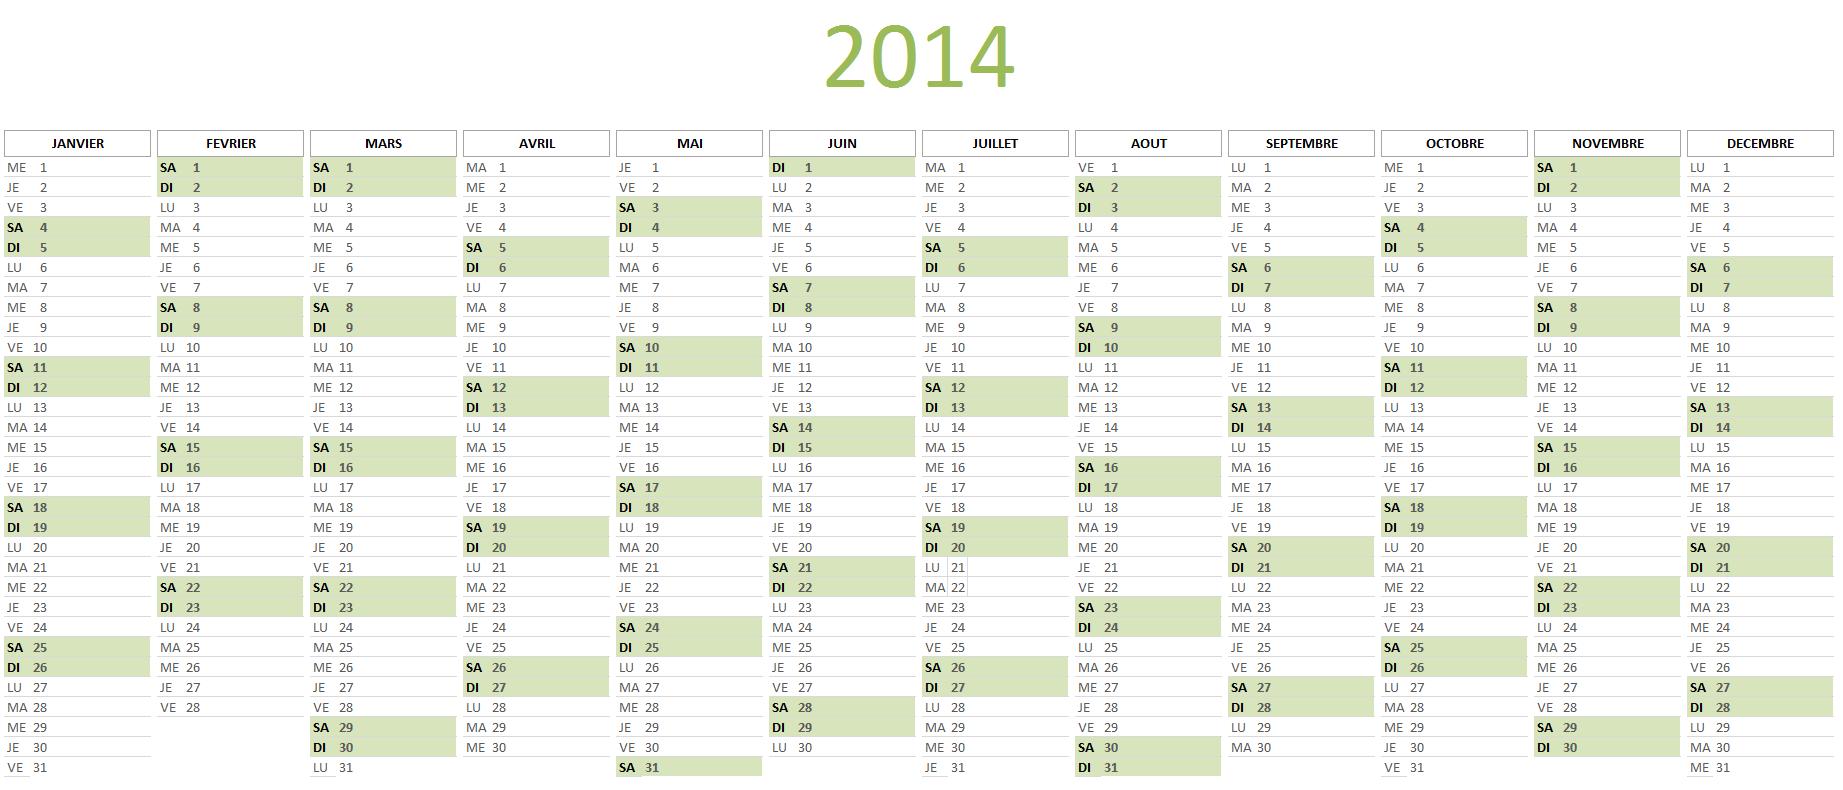 modele planning 2014 vierge